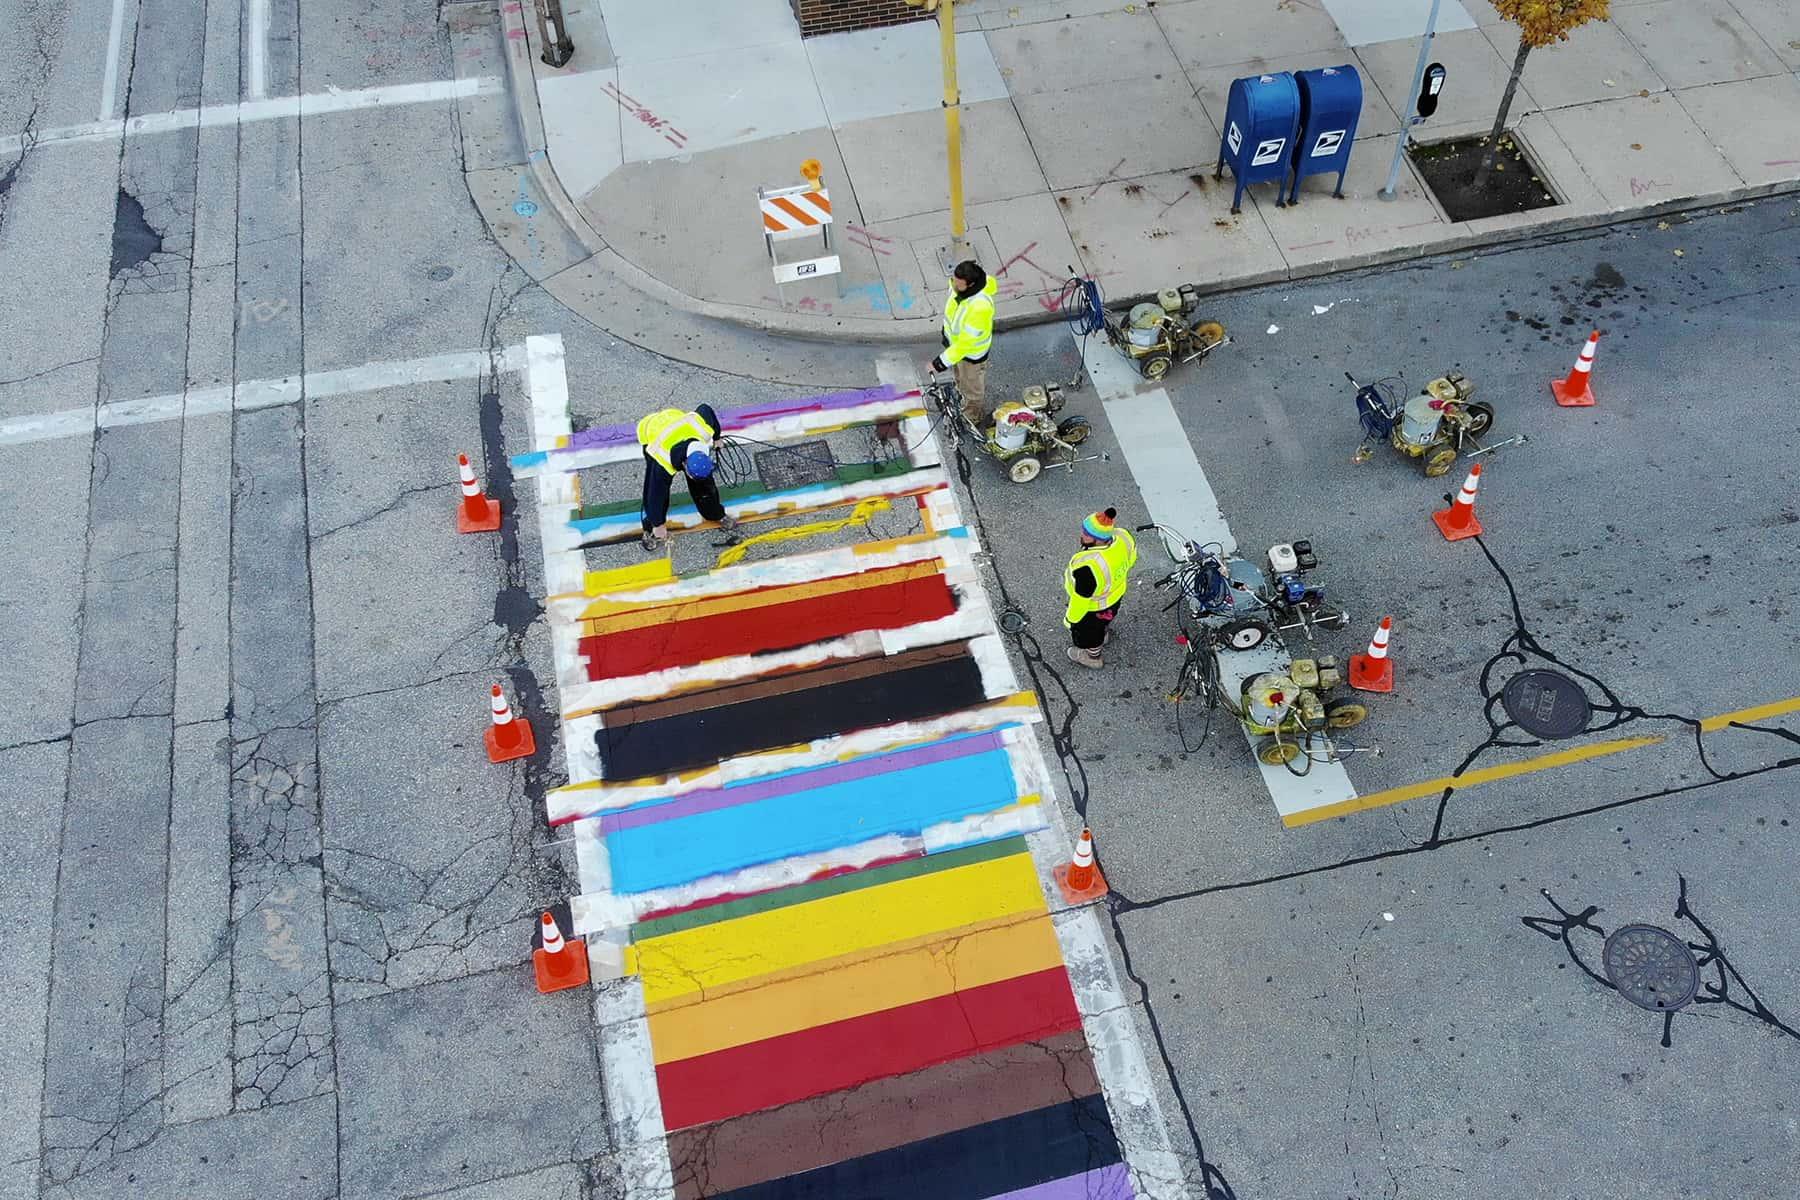 110318_rainbowcrosswalk_dronephoto_012